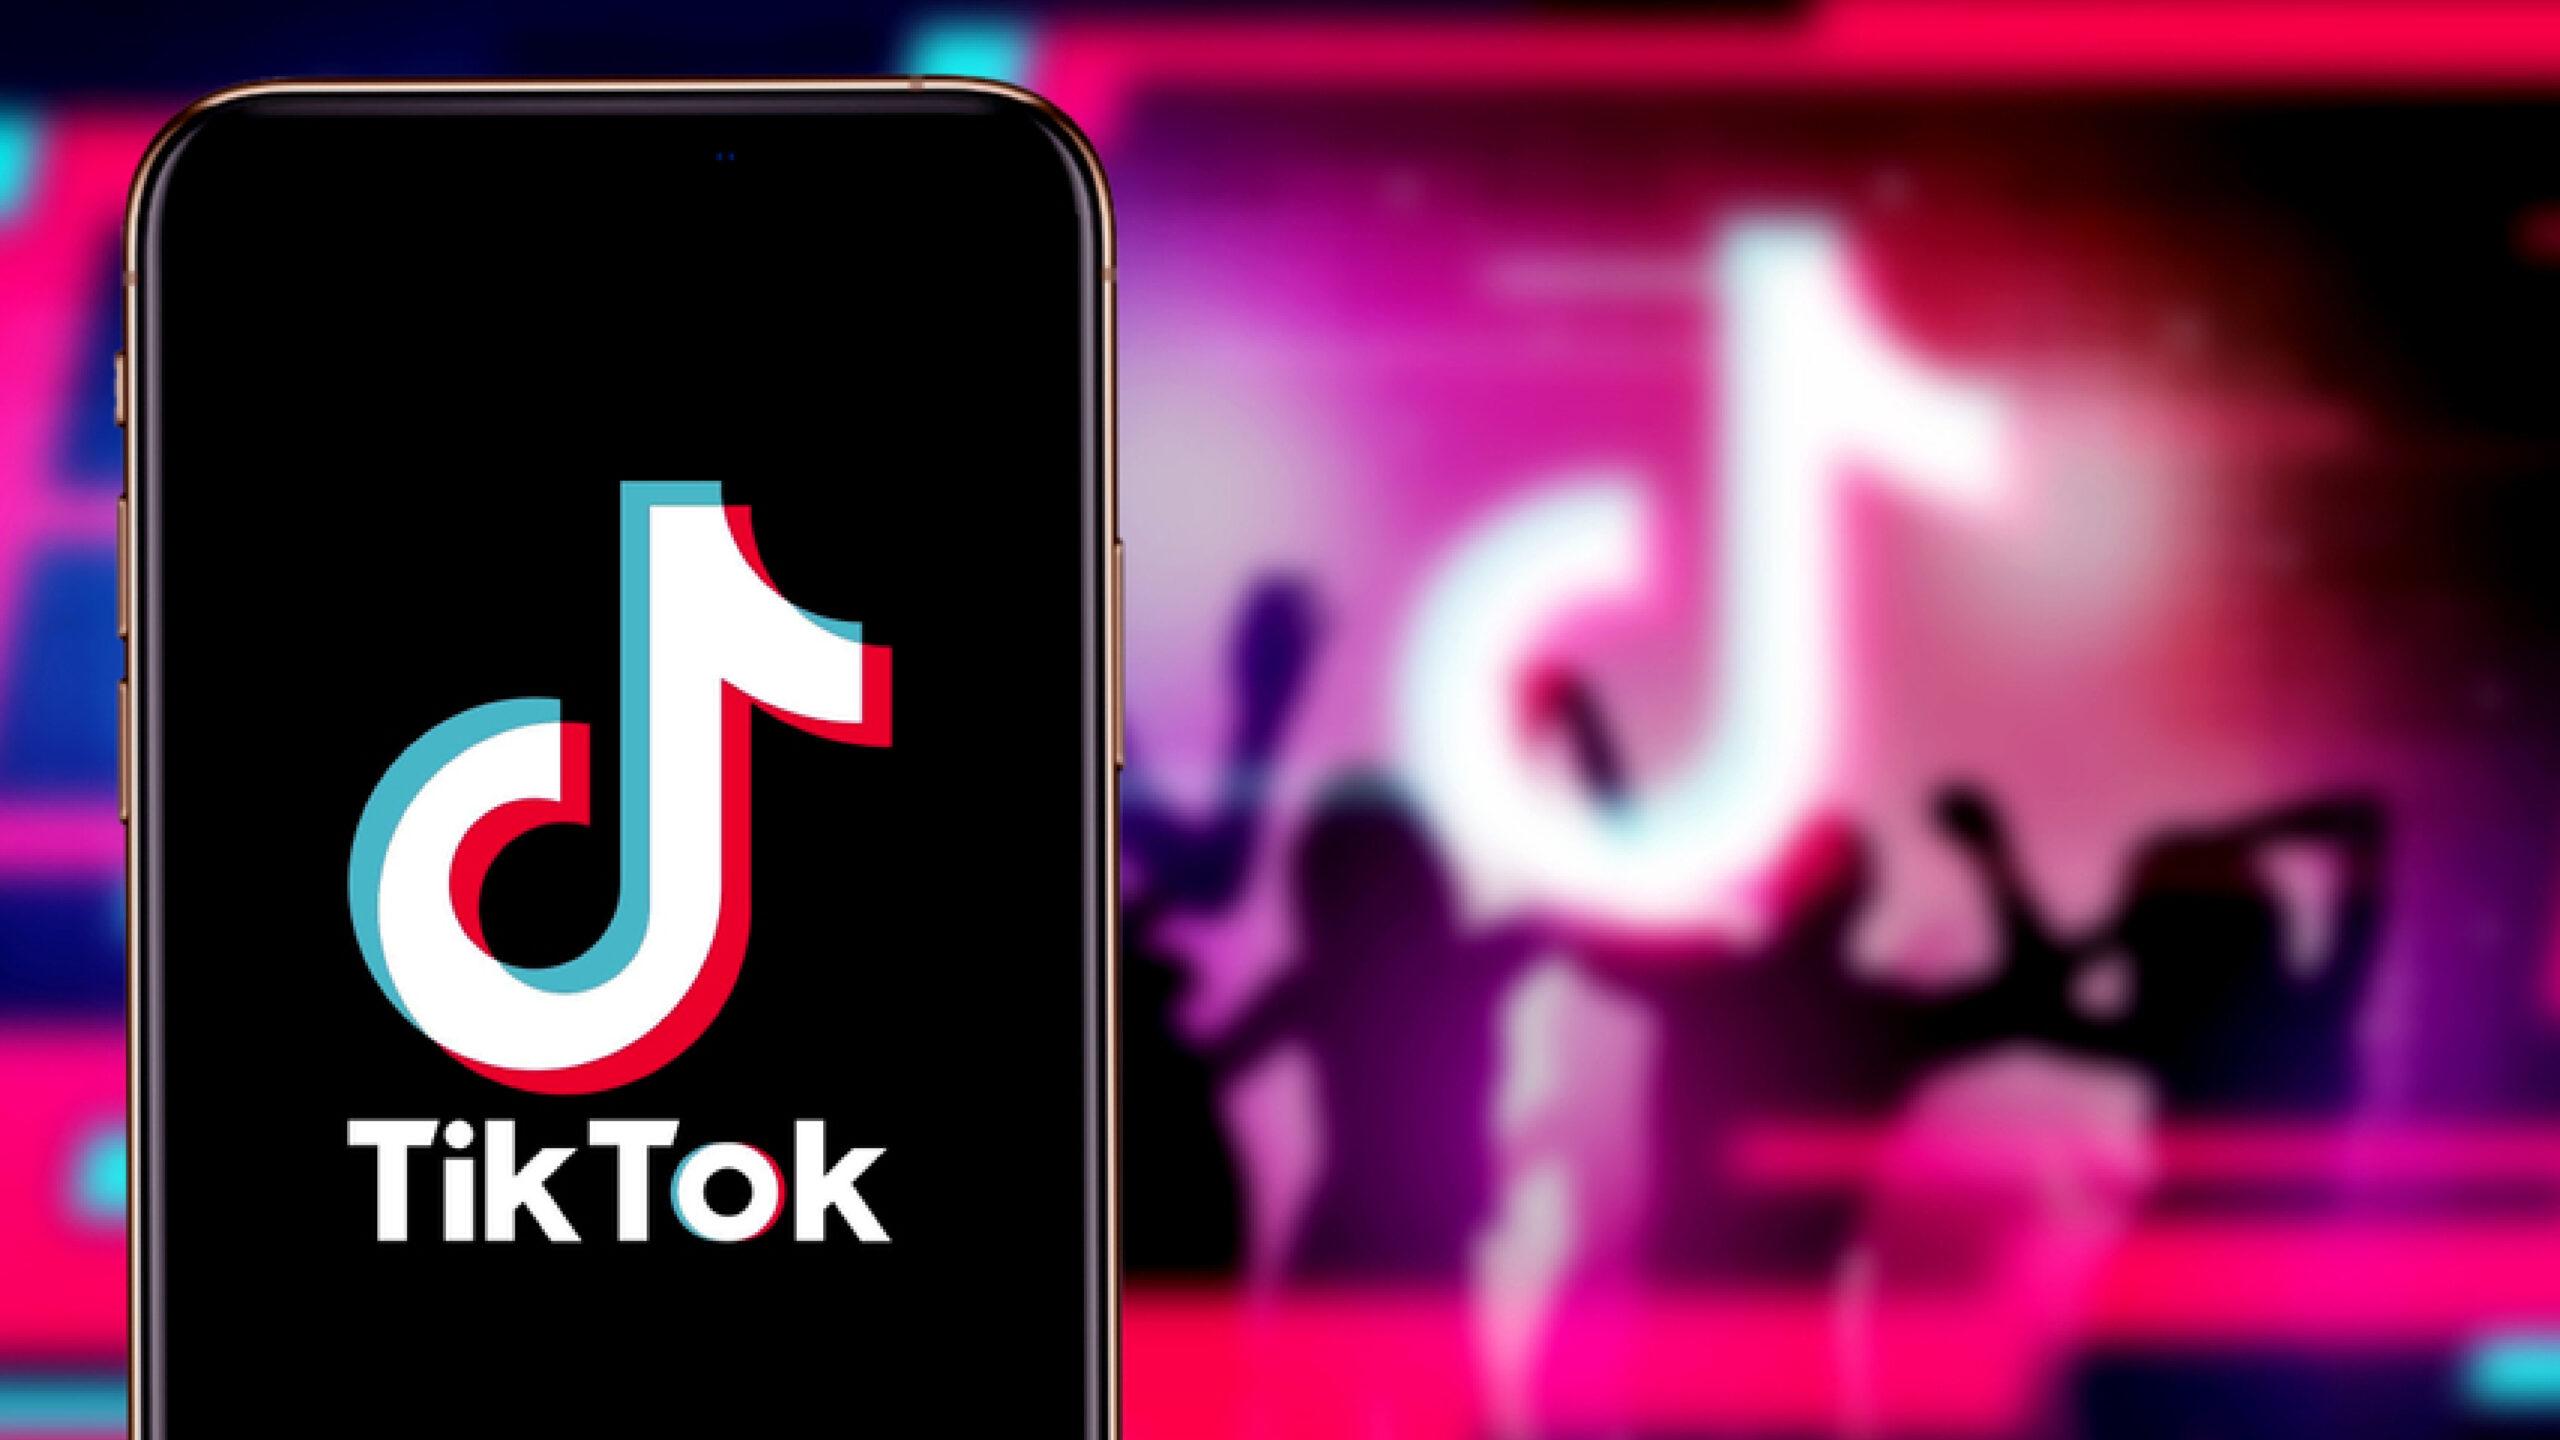 Access to 500,000 'immoral' TikTok videos blocked in Pakistan